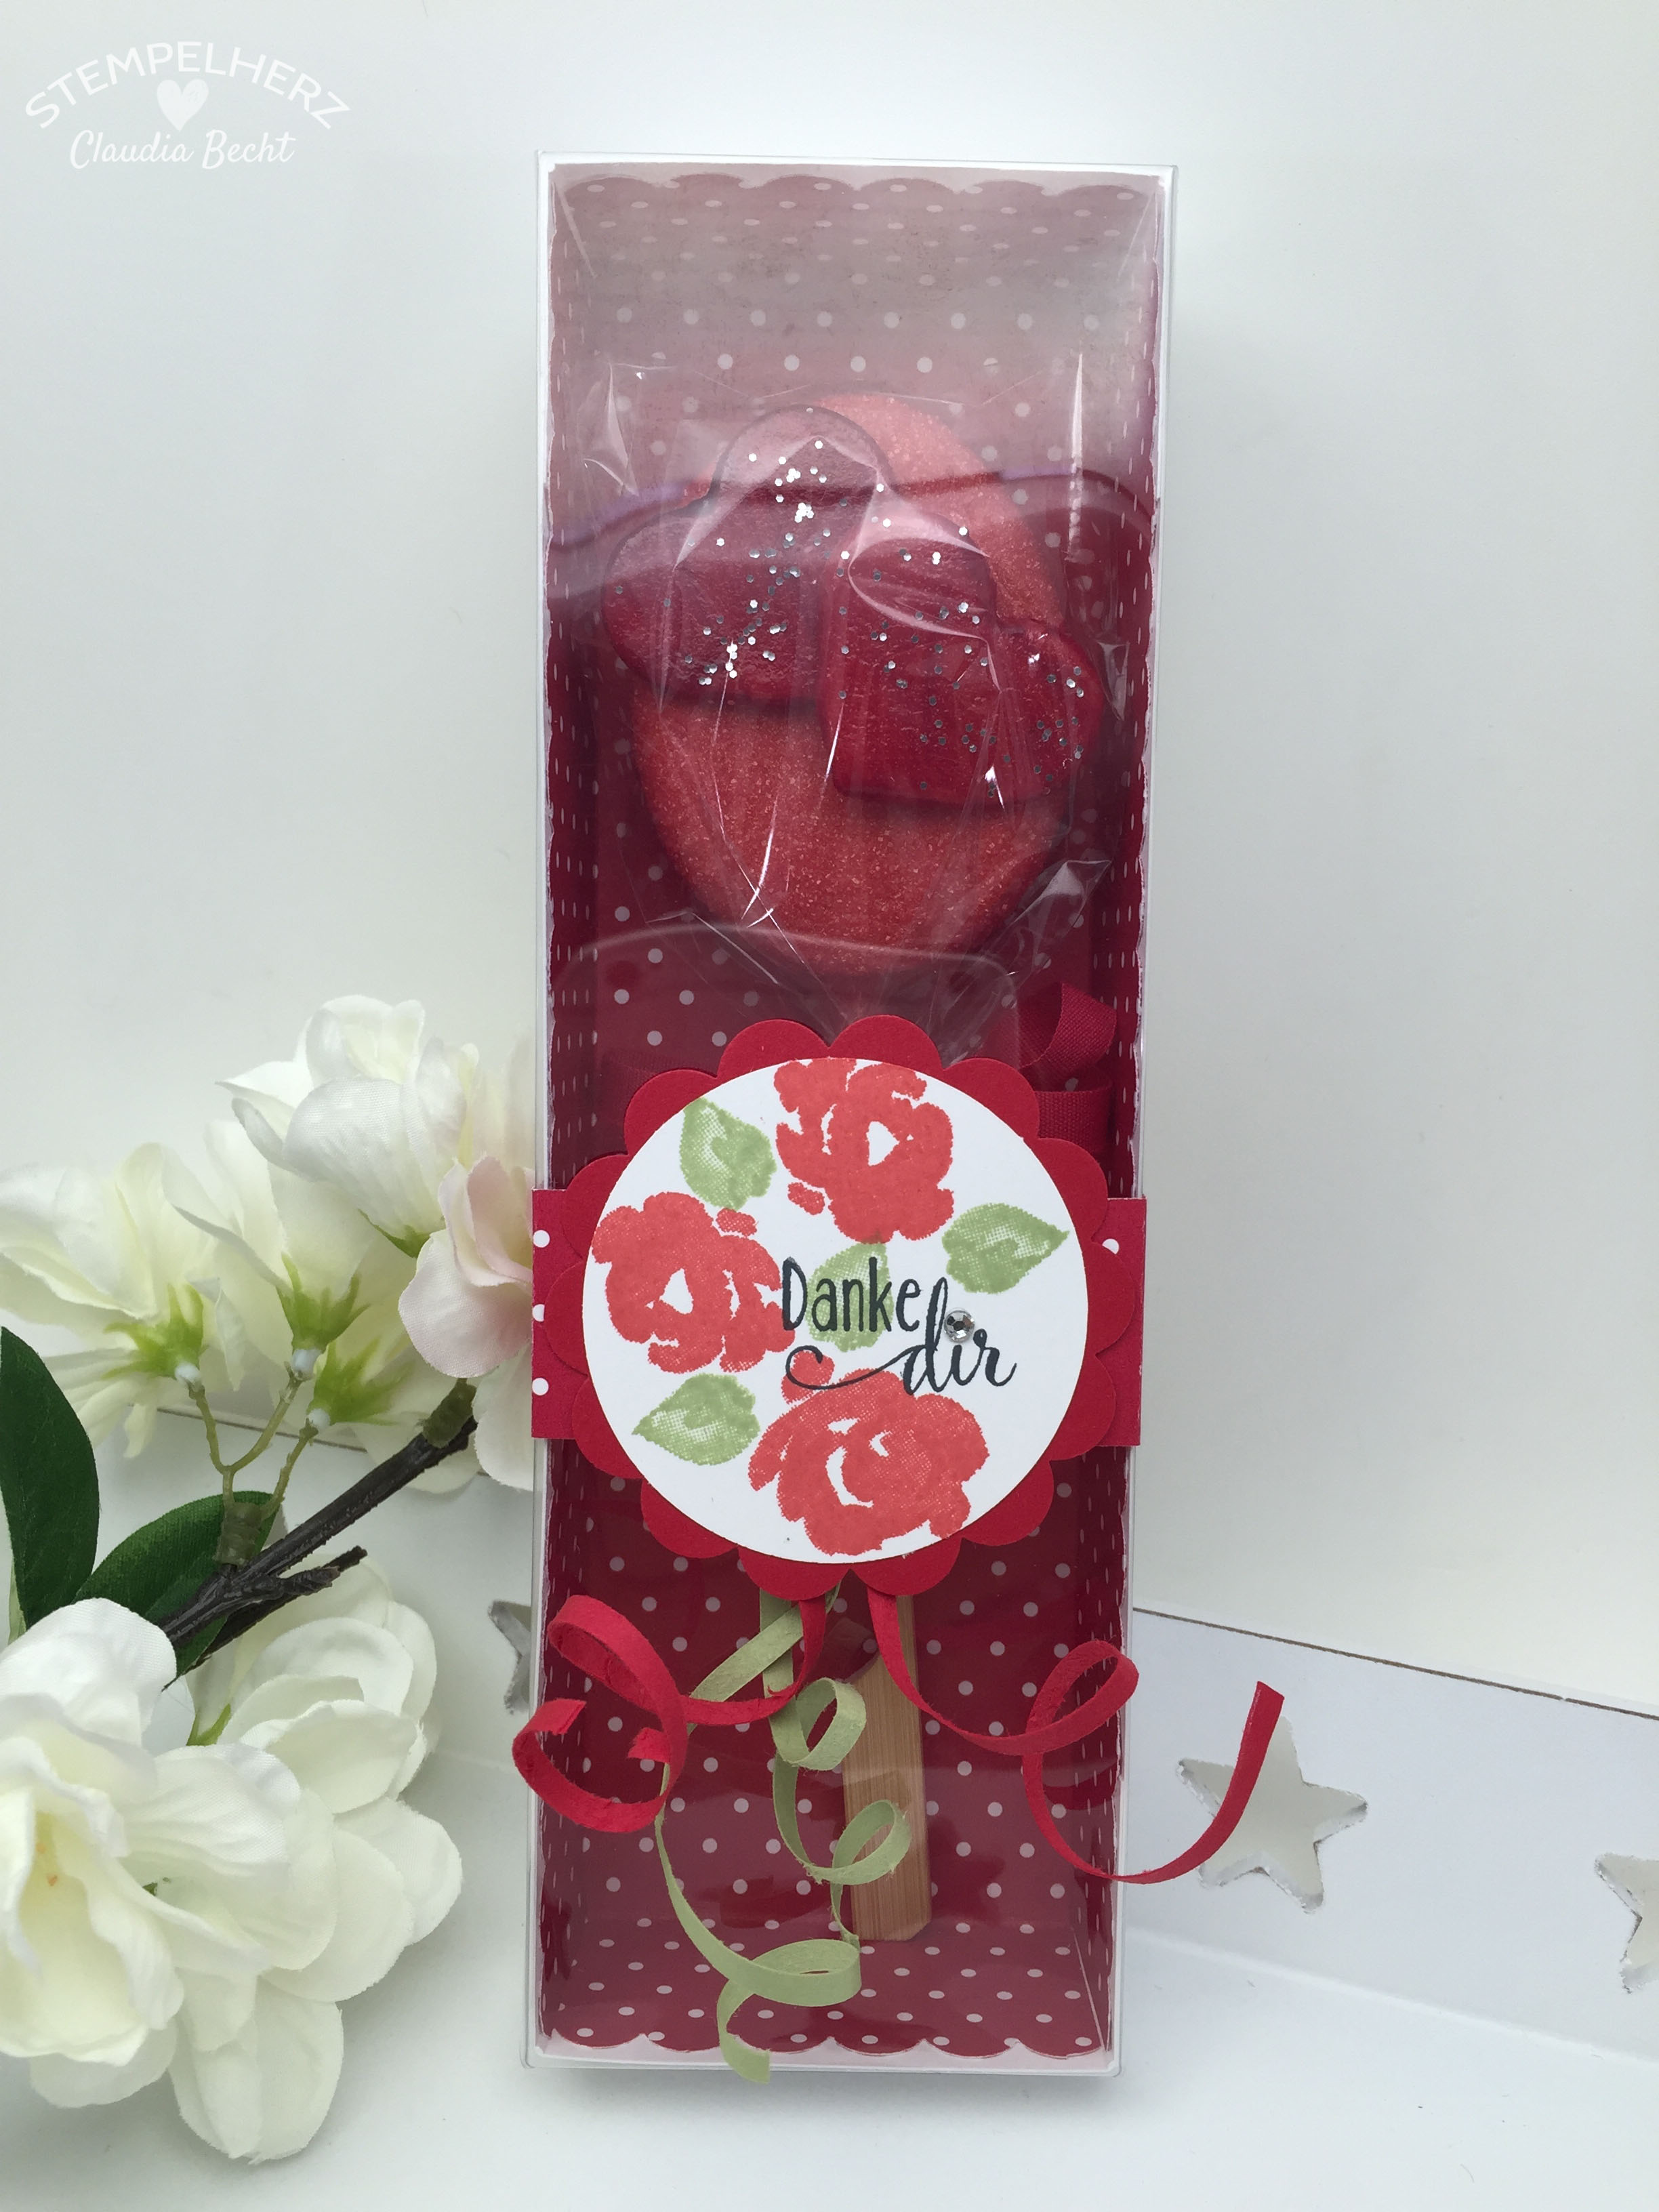 Stampin Up-Stempelherz-Verpackung-Box-Verpackung Cake Pop-Muttertag-Painted Petals-Cake Pop Verpackung Danke Dir zum Muttertag 01